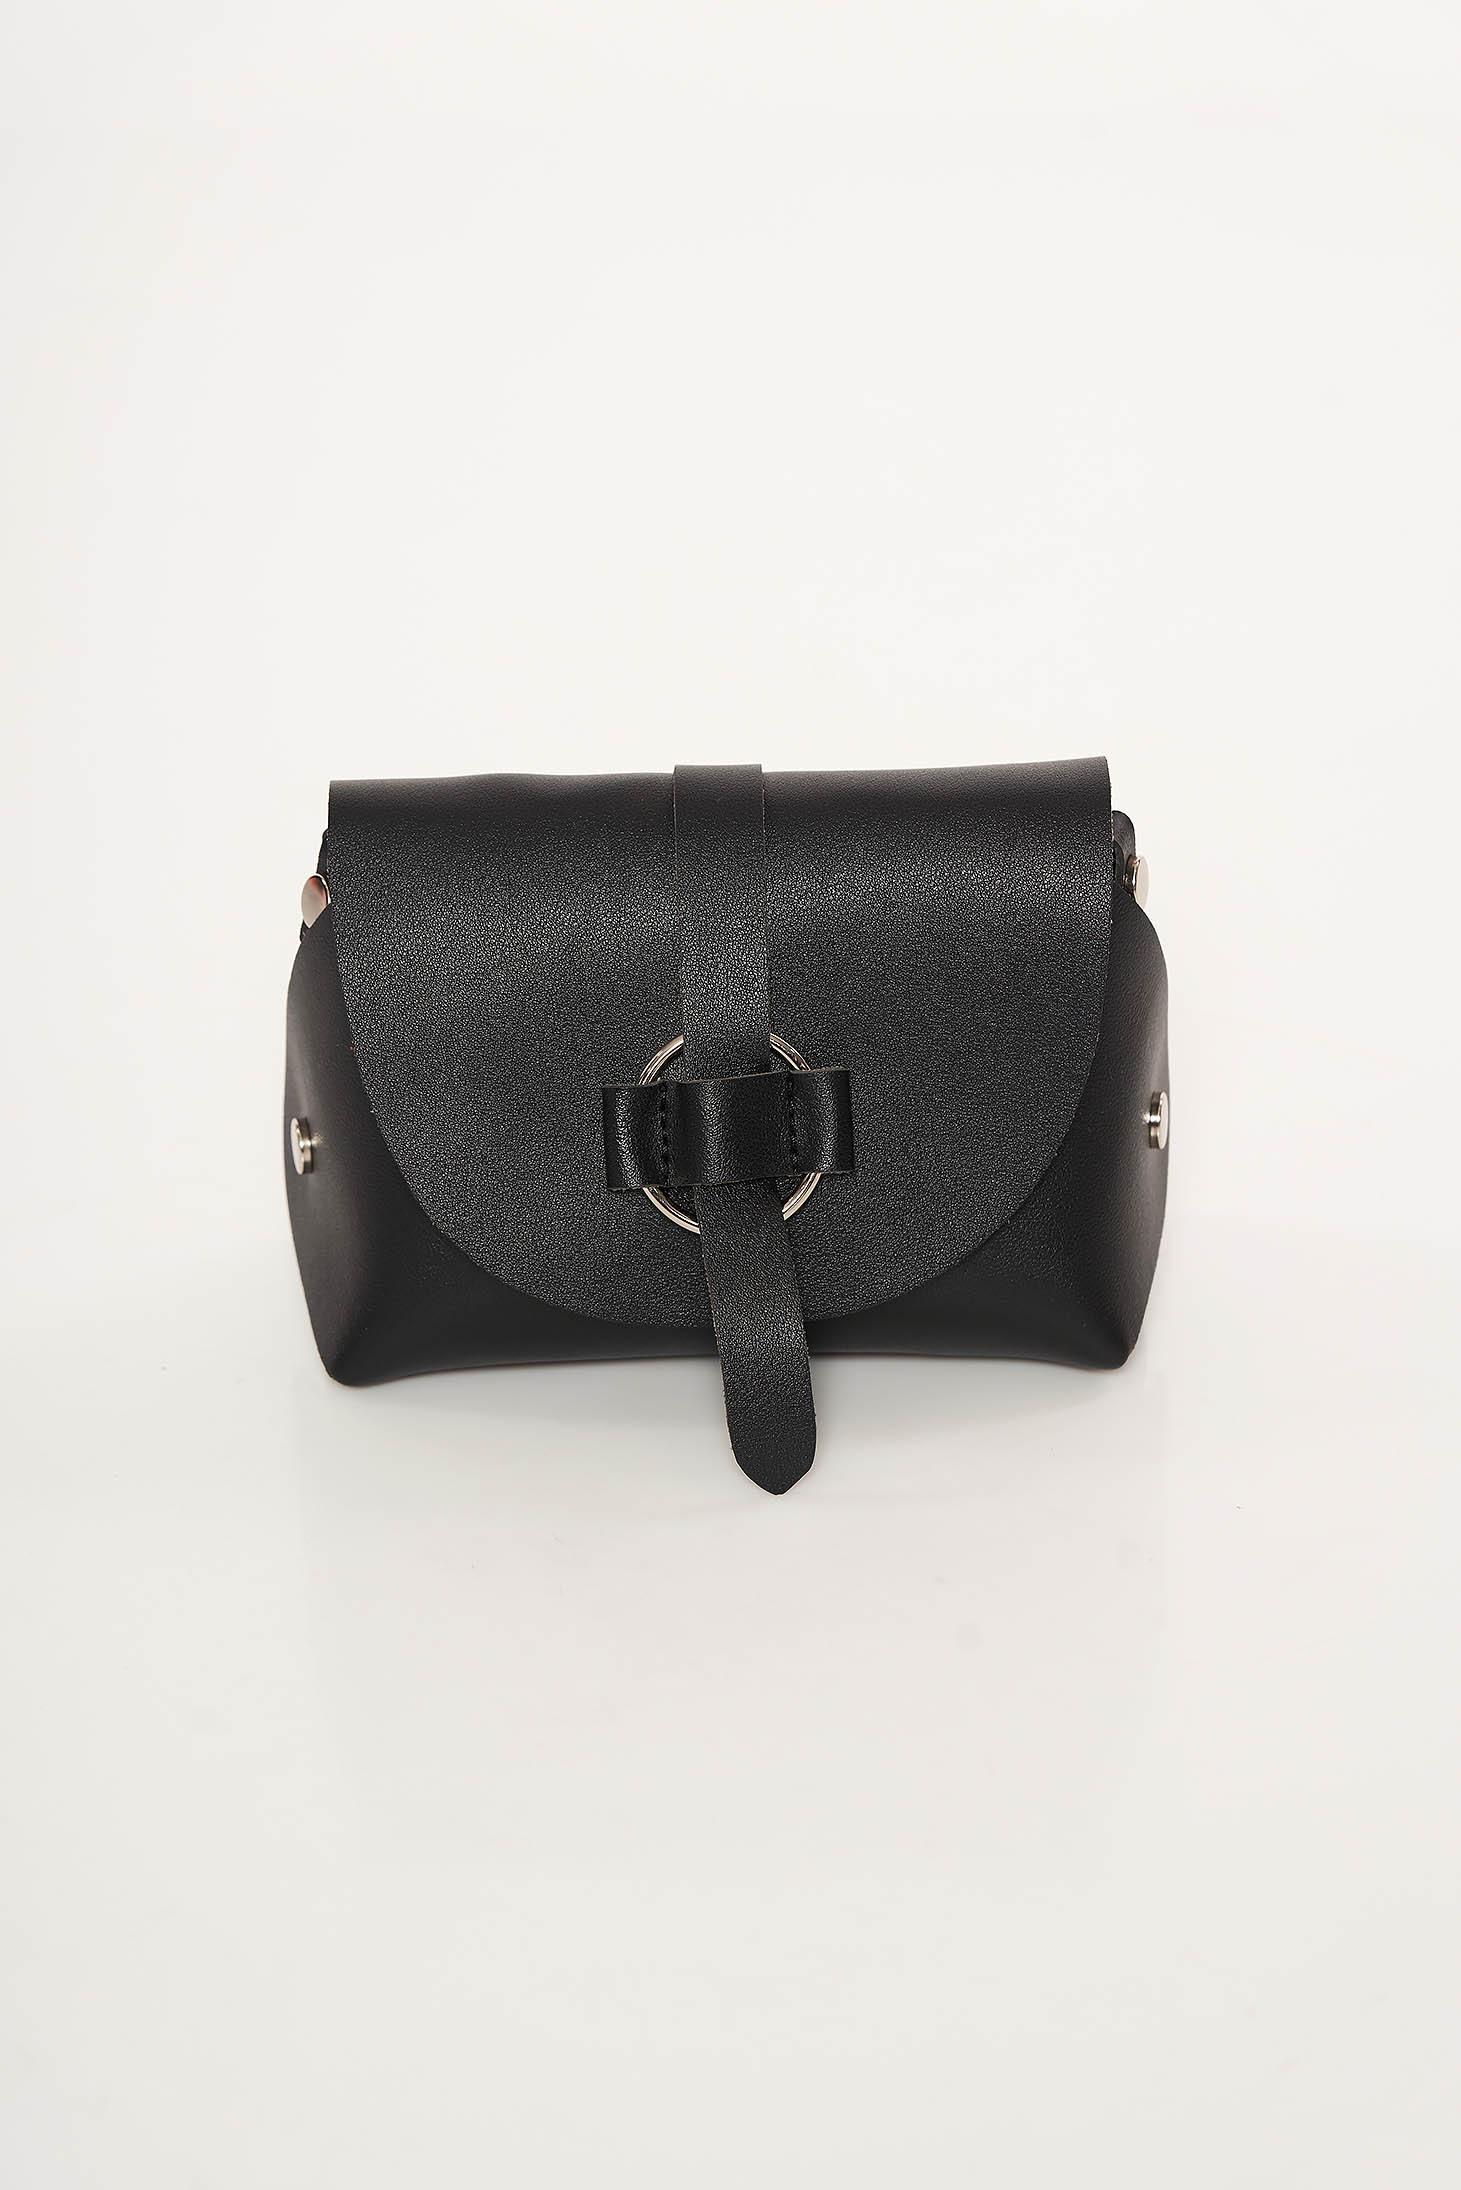 Geanta dama neagra casual din piele ecologica cu maner lung tip lantisor